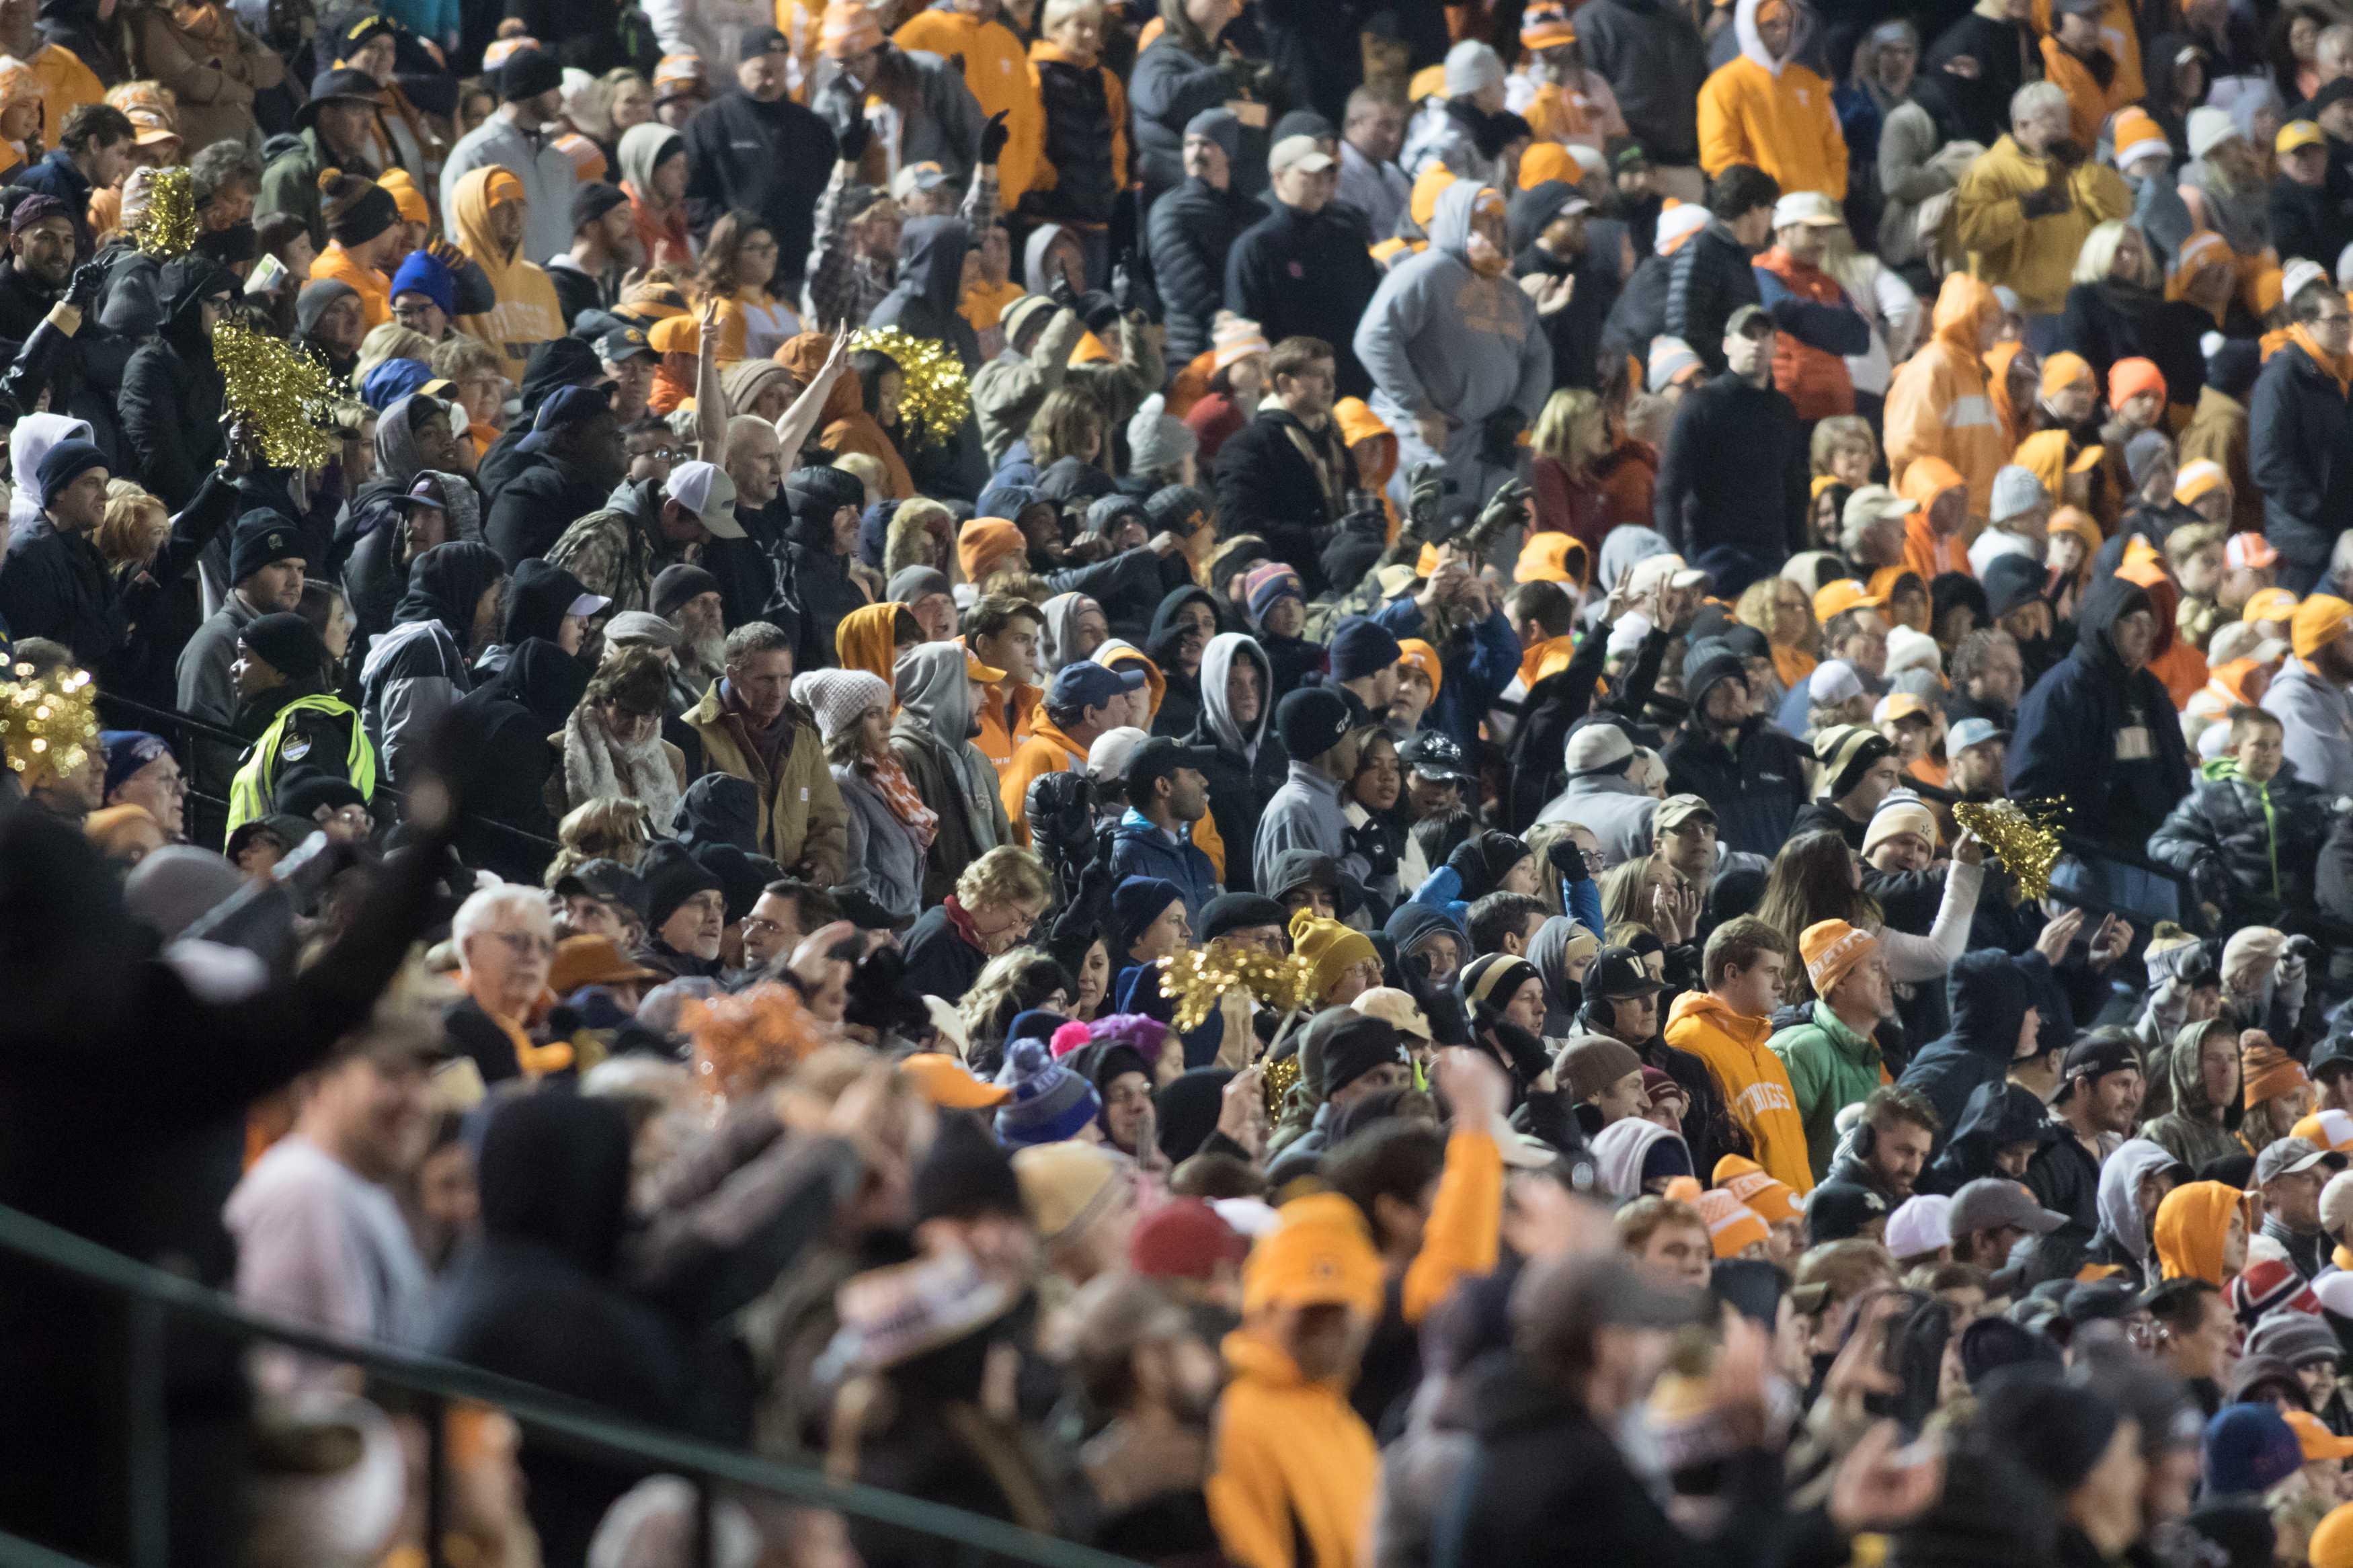 Fans as Vanderbilt beat #17 Tennessee 45-34 at Vanderbilt Stadium November 26, 2016. Photo by Ziyi Liu